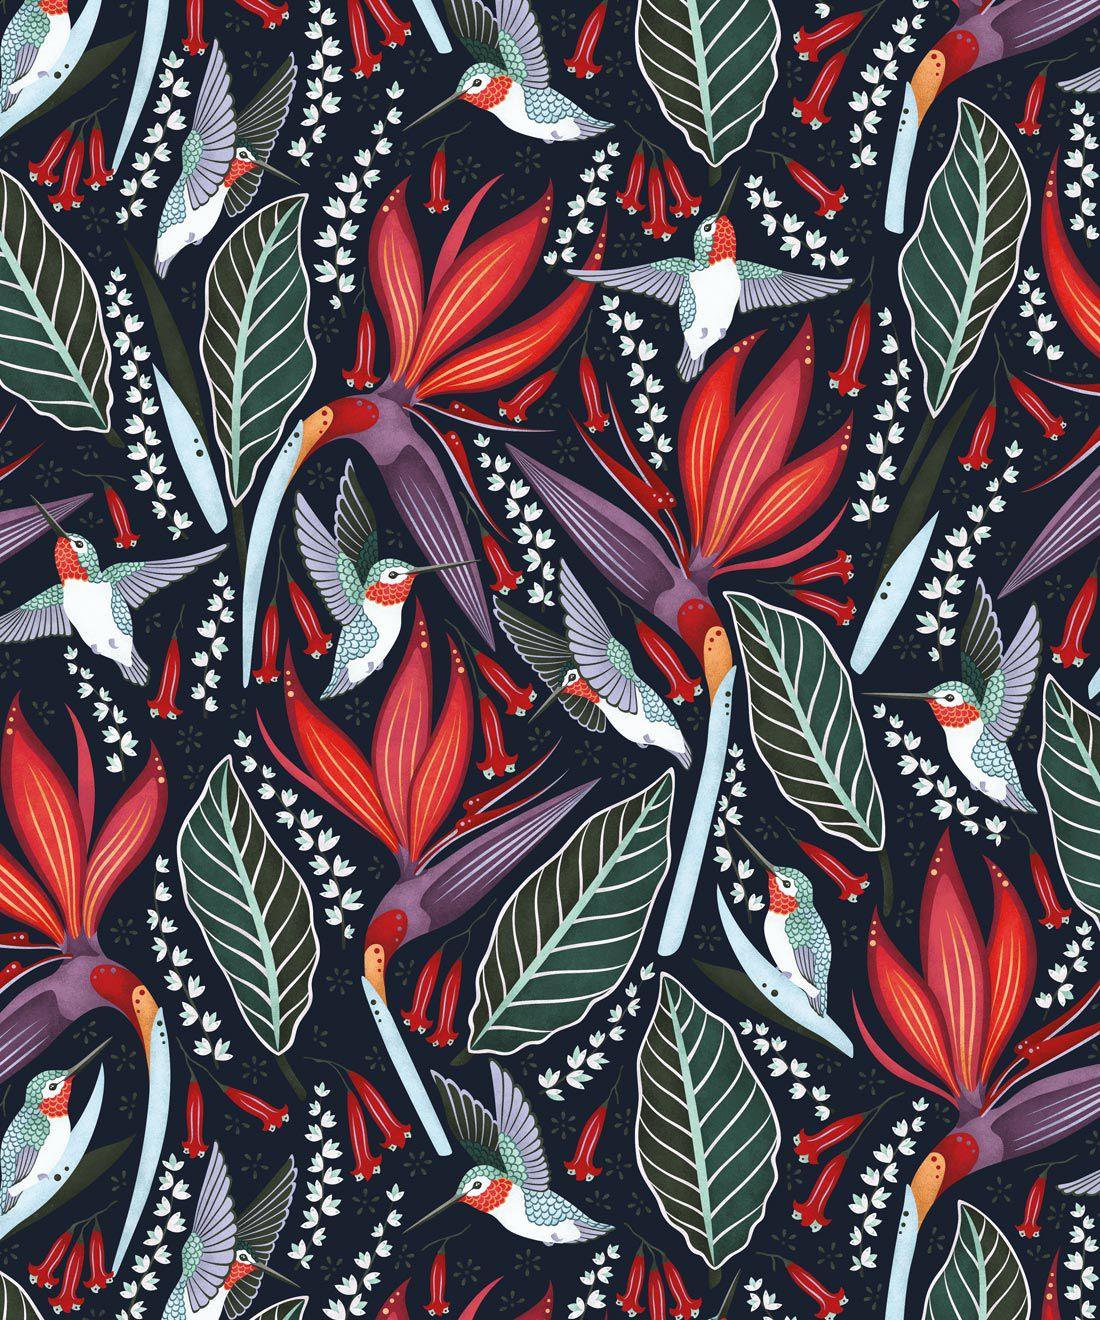 Hummingbird Wallpaper • Birds Of Paradise Flower • Bird Wallpaper • Red Flowers • Black Cherry